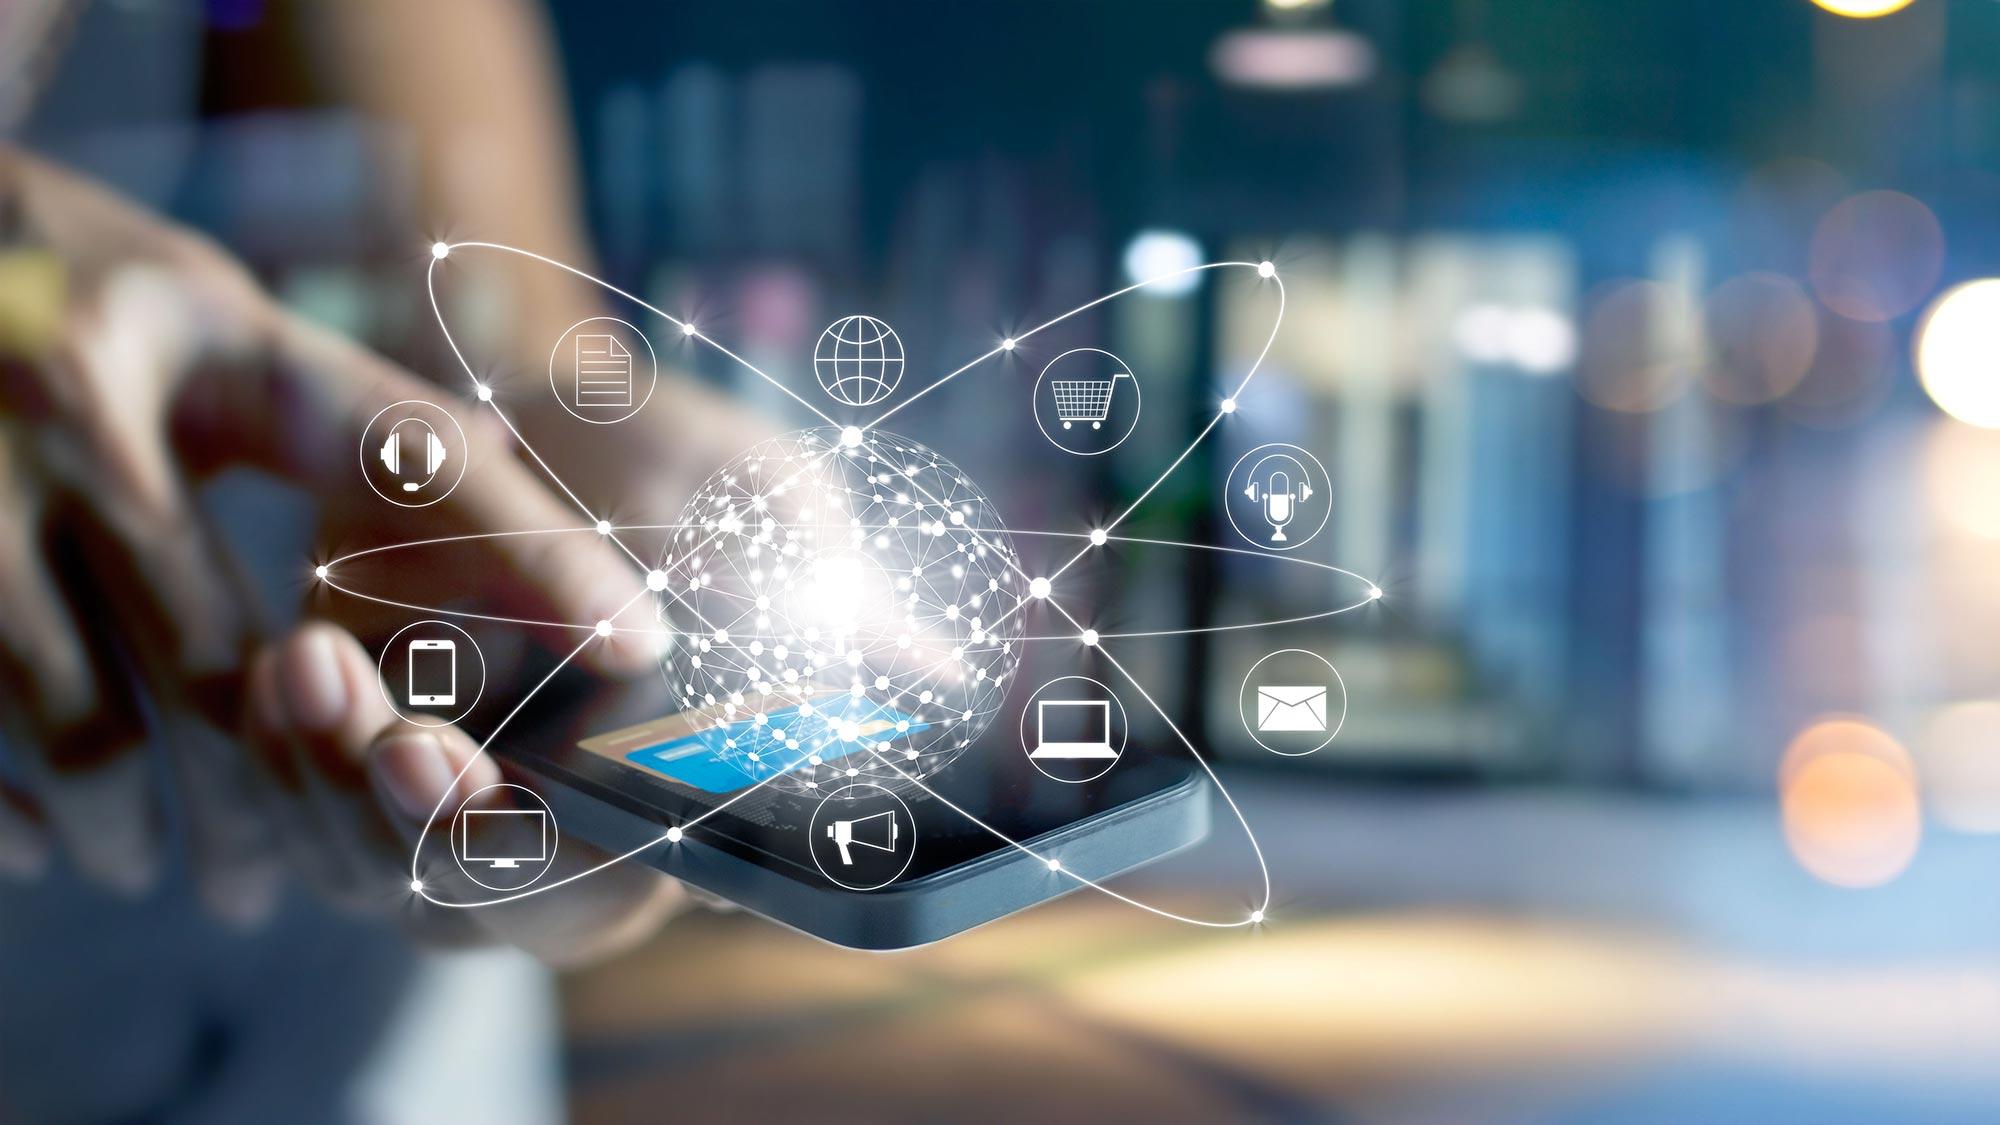 man-smartphone-telephony-applications.jpg